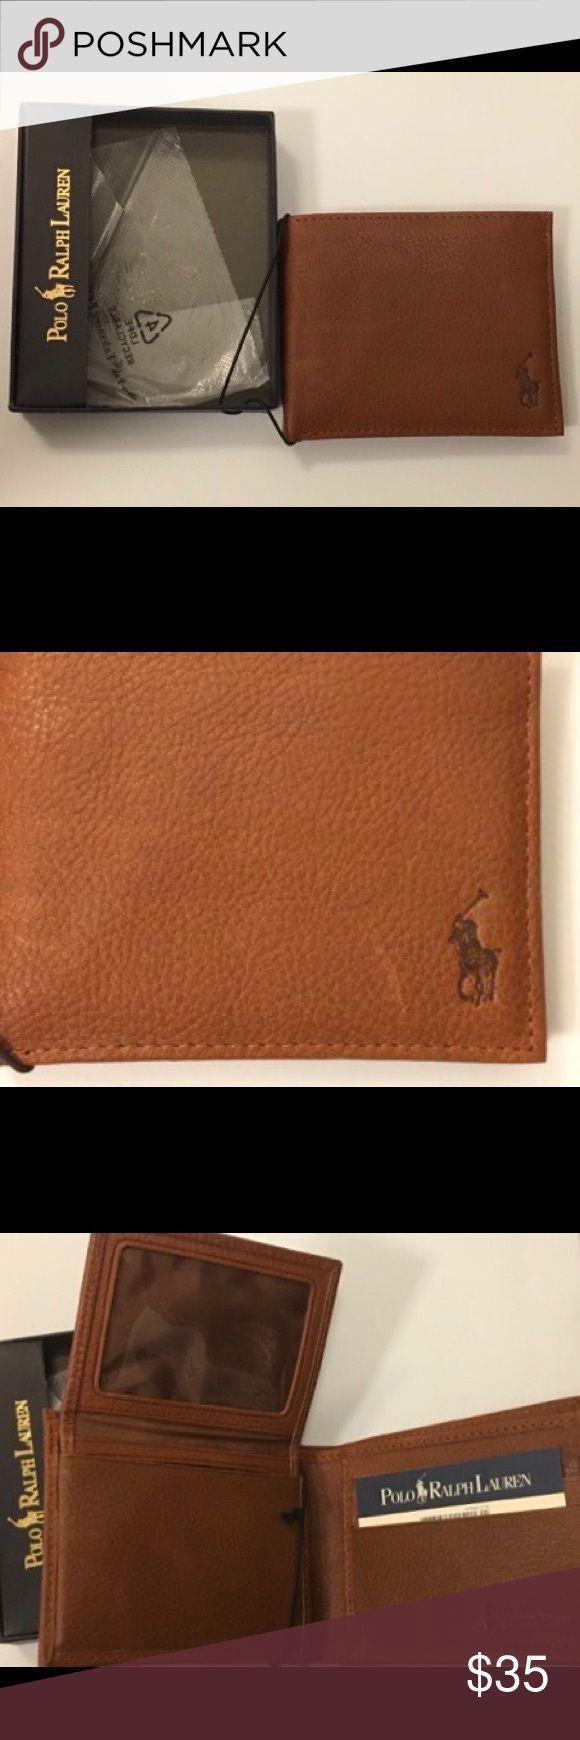 Polo by Ralph Lauren Men's Leather Wallet Brown NWT Brown leather wallet. Polo by Ralph Lauren. Polo by Ralph Lauren Bags Wallets